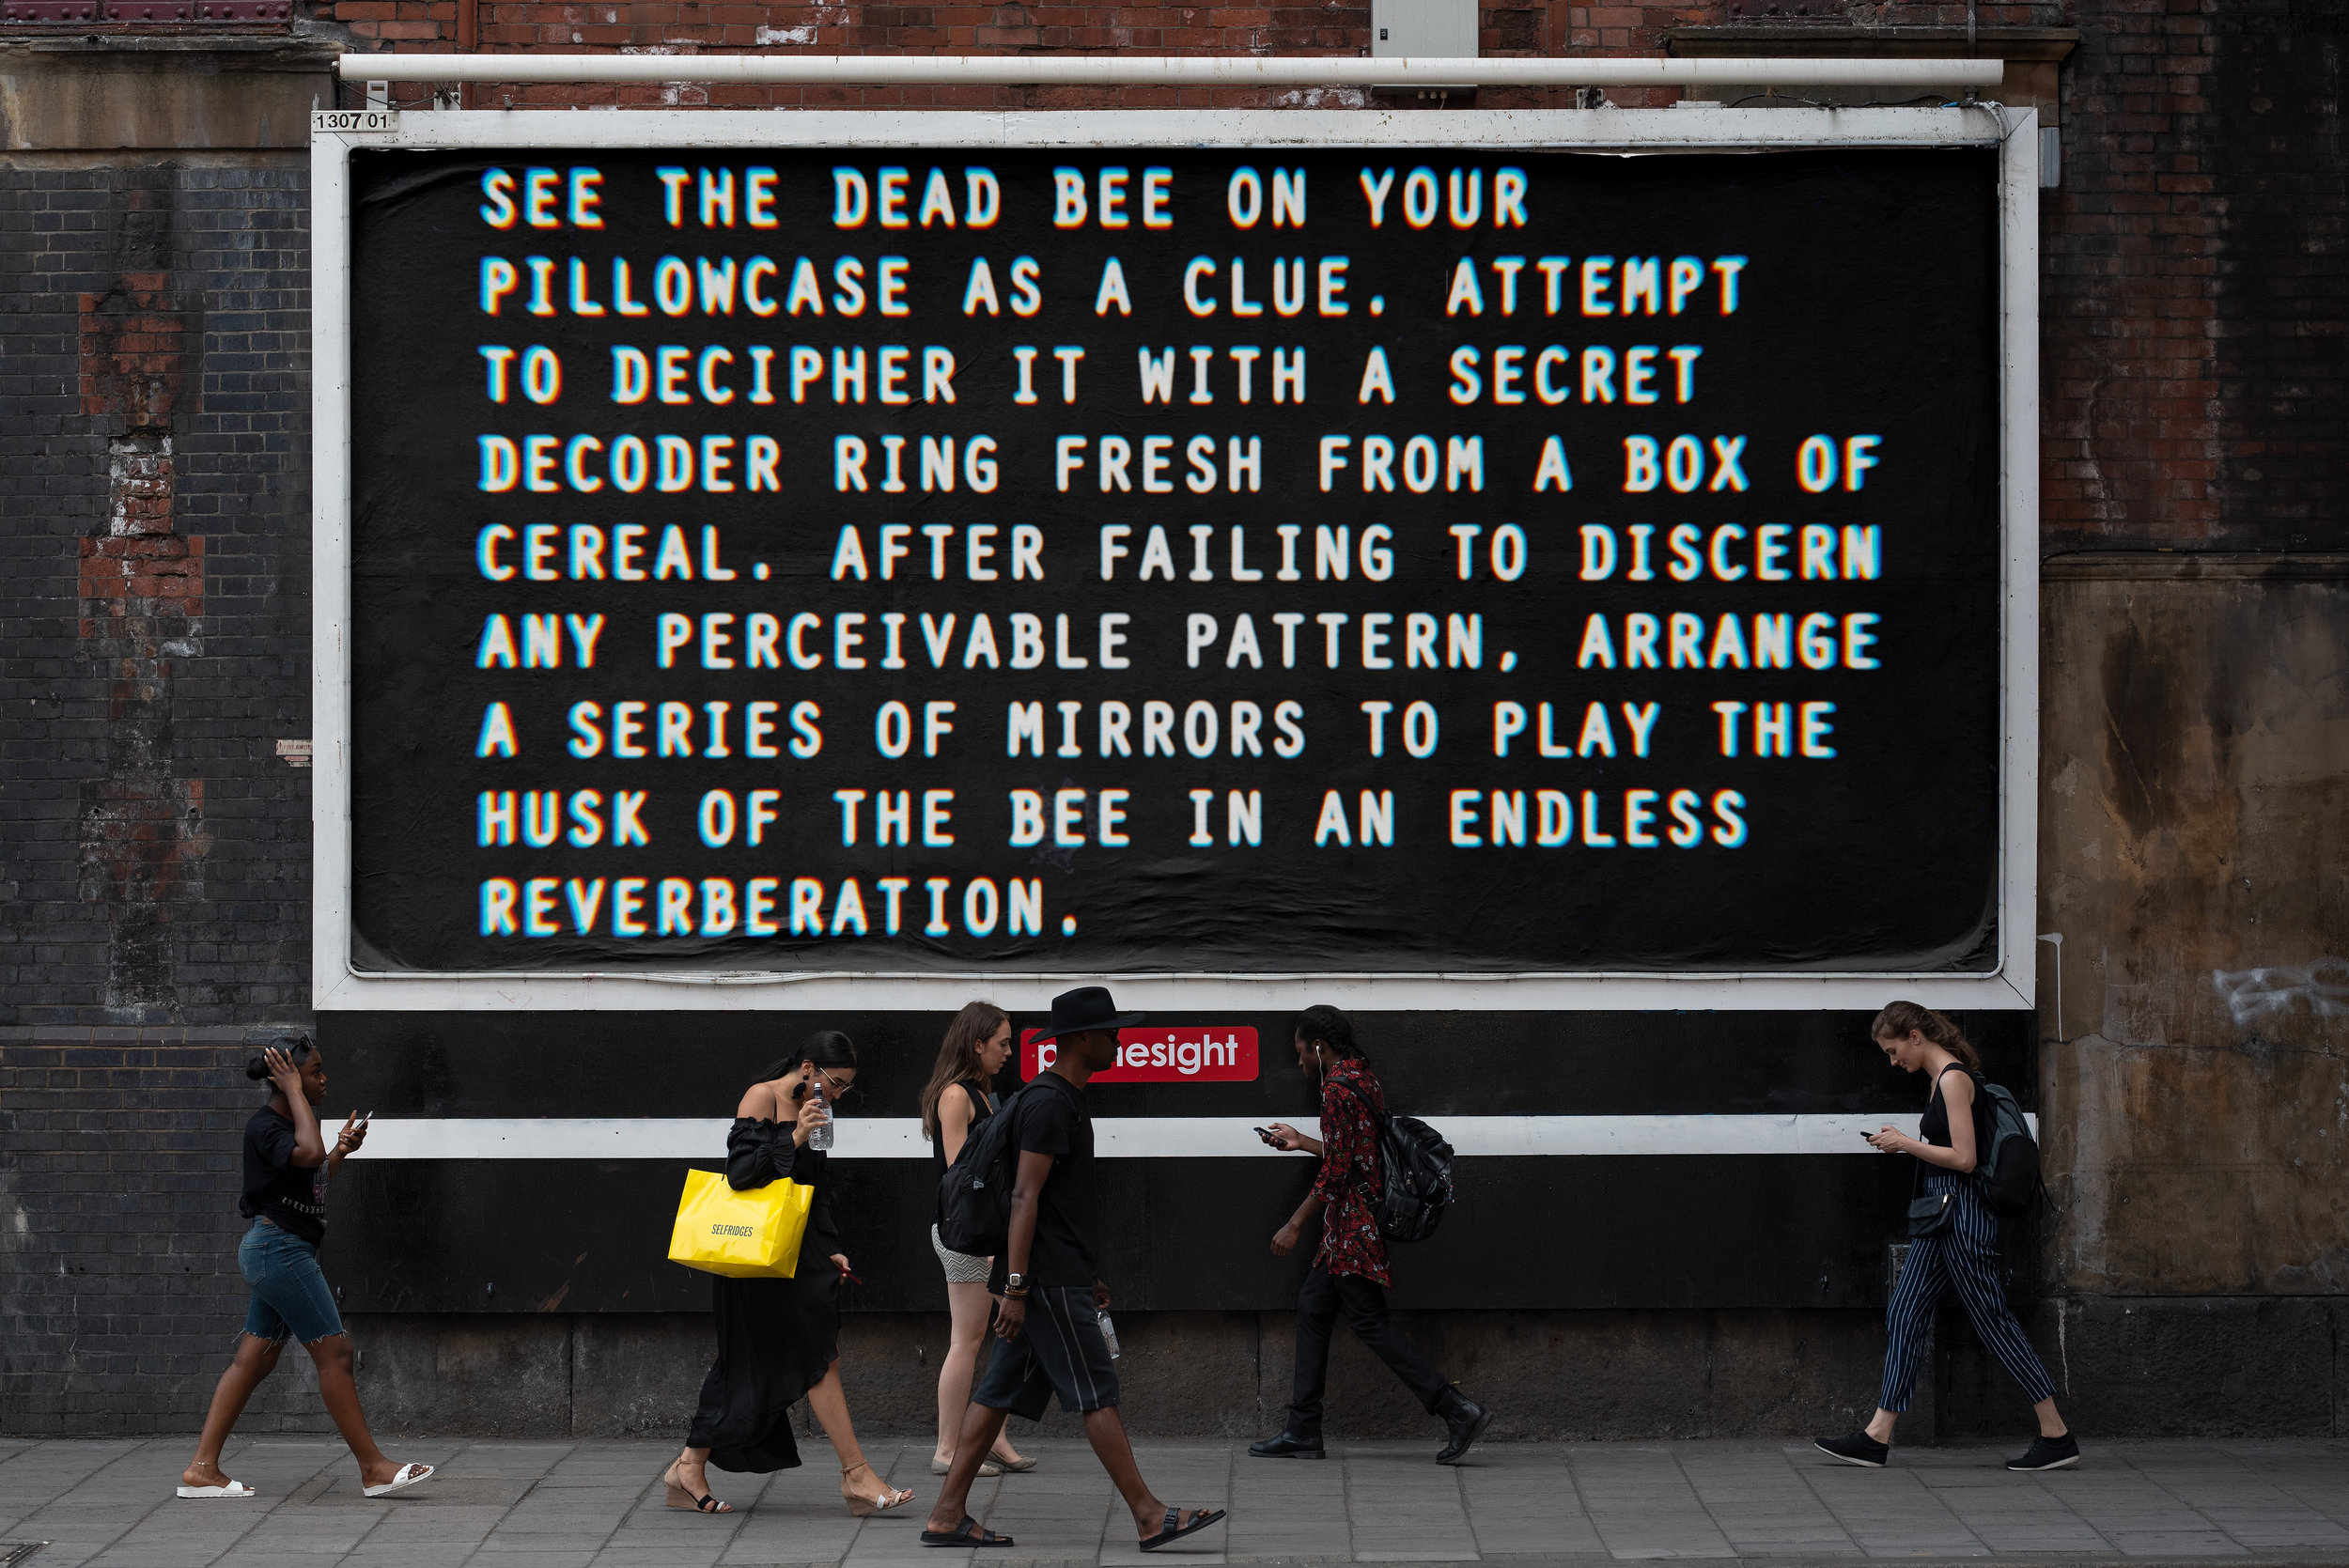 1_BEE_225_billboard_urban_poster_mockup 2.jpg